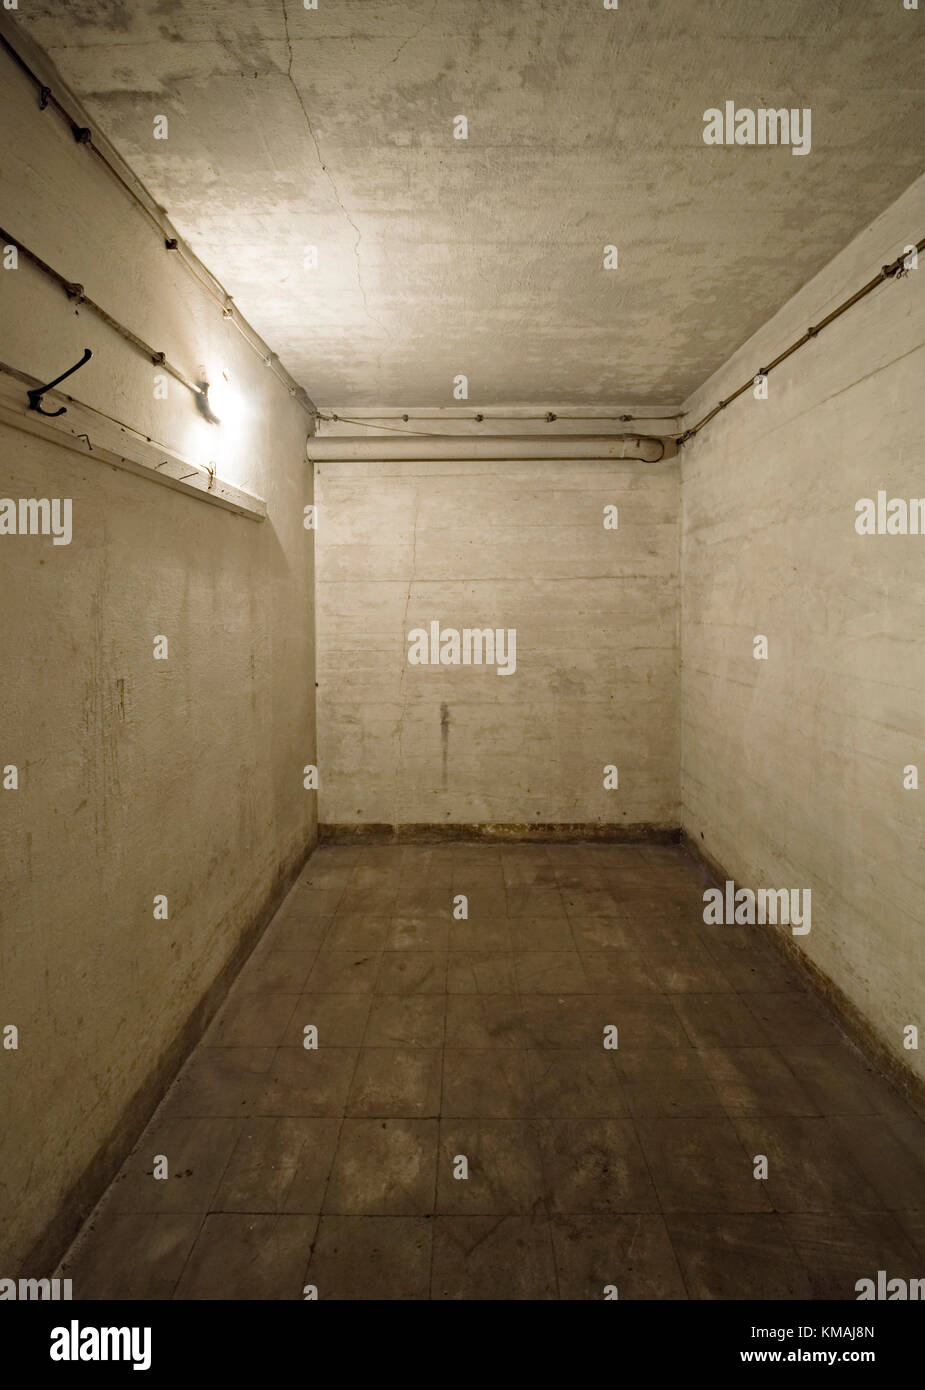 Bunker, Hannover, Wallpaper, inside, Umbau, Umnutzung, leer, Tapete, Raum, Lampe, einsam, 2.Weltkrieg, alt, - Stock Image